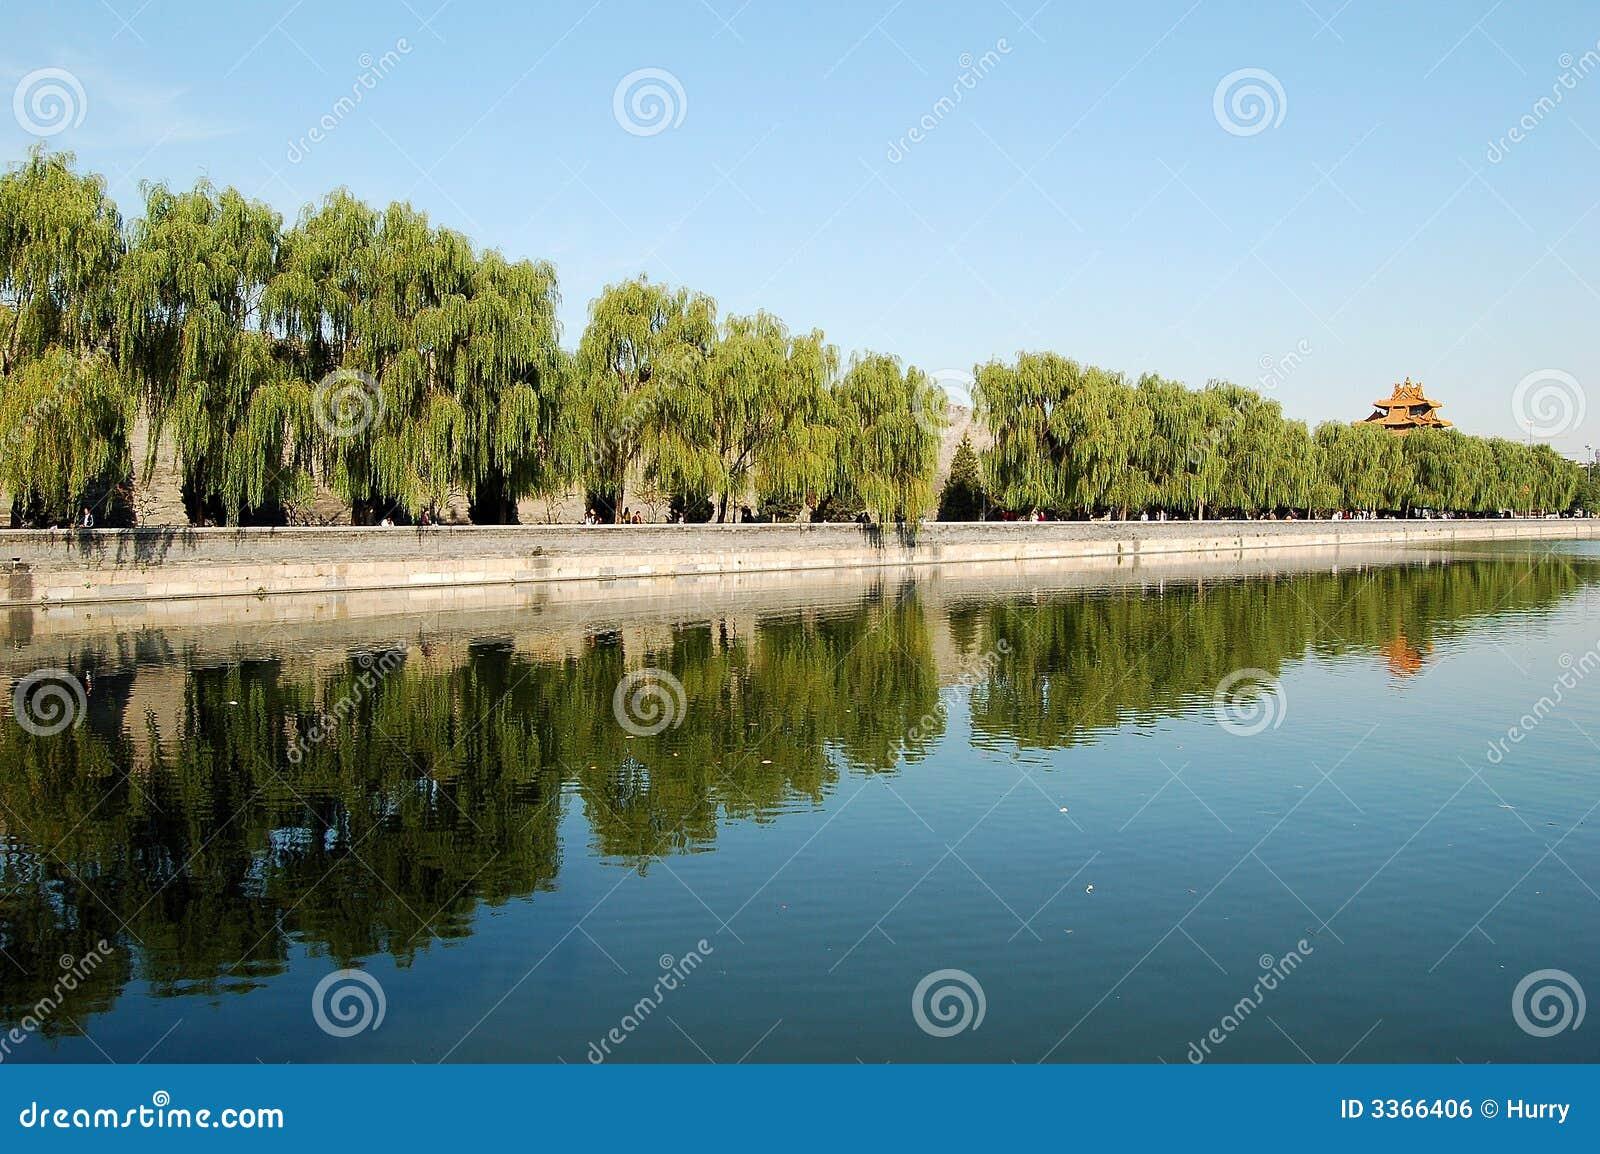 Moat, the forbidden city